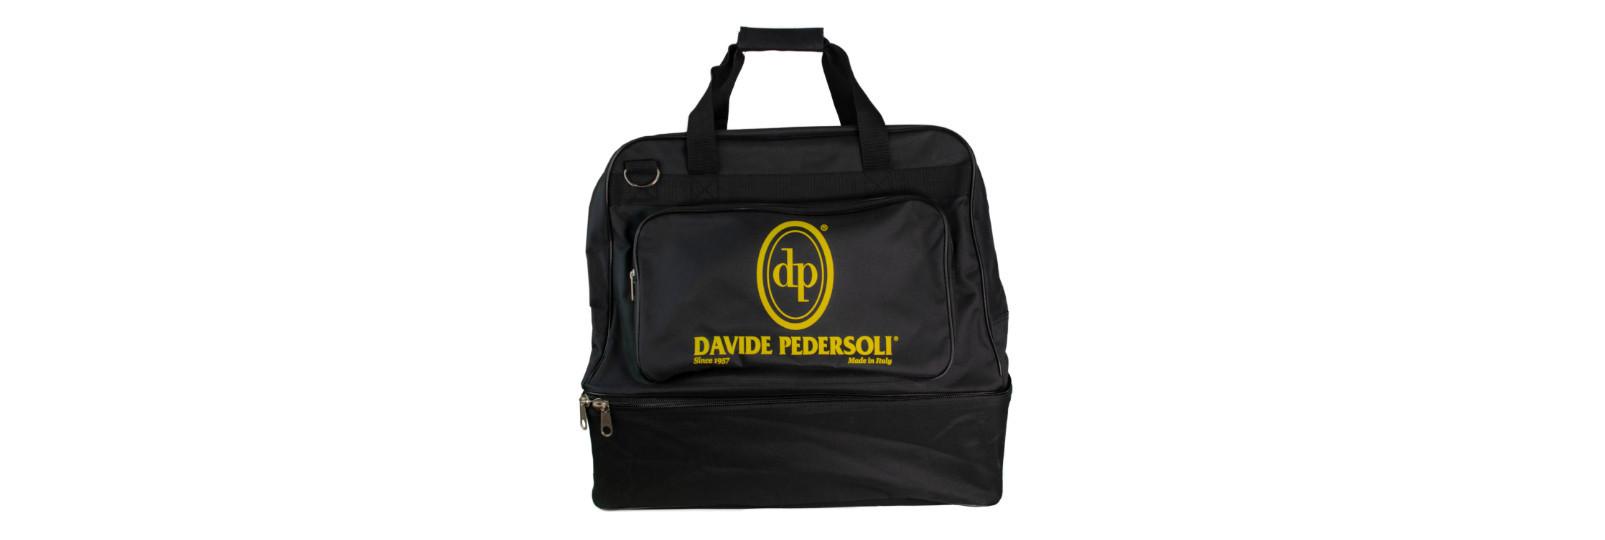 Pedersoli Match bag